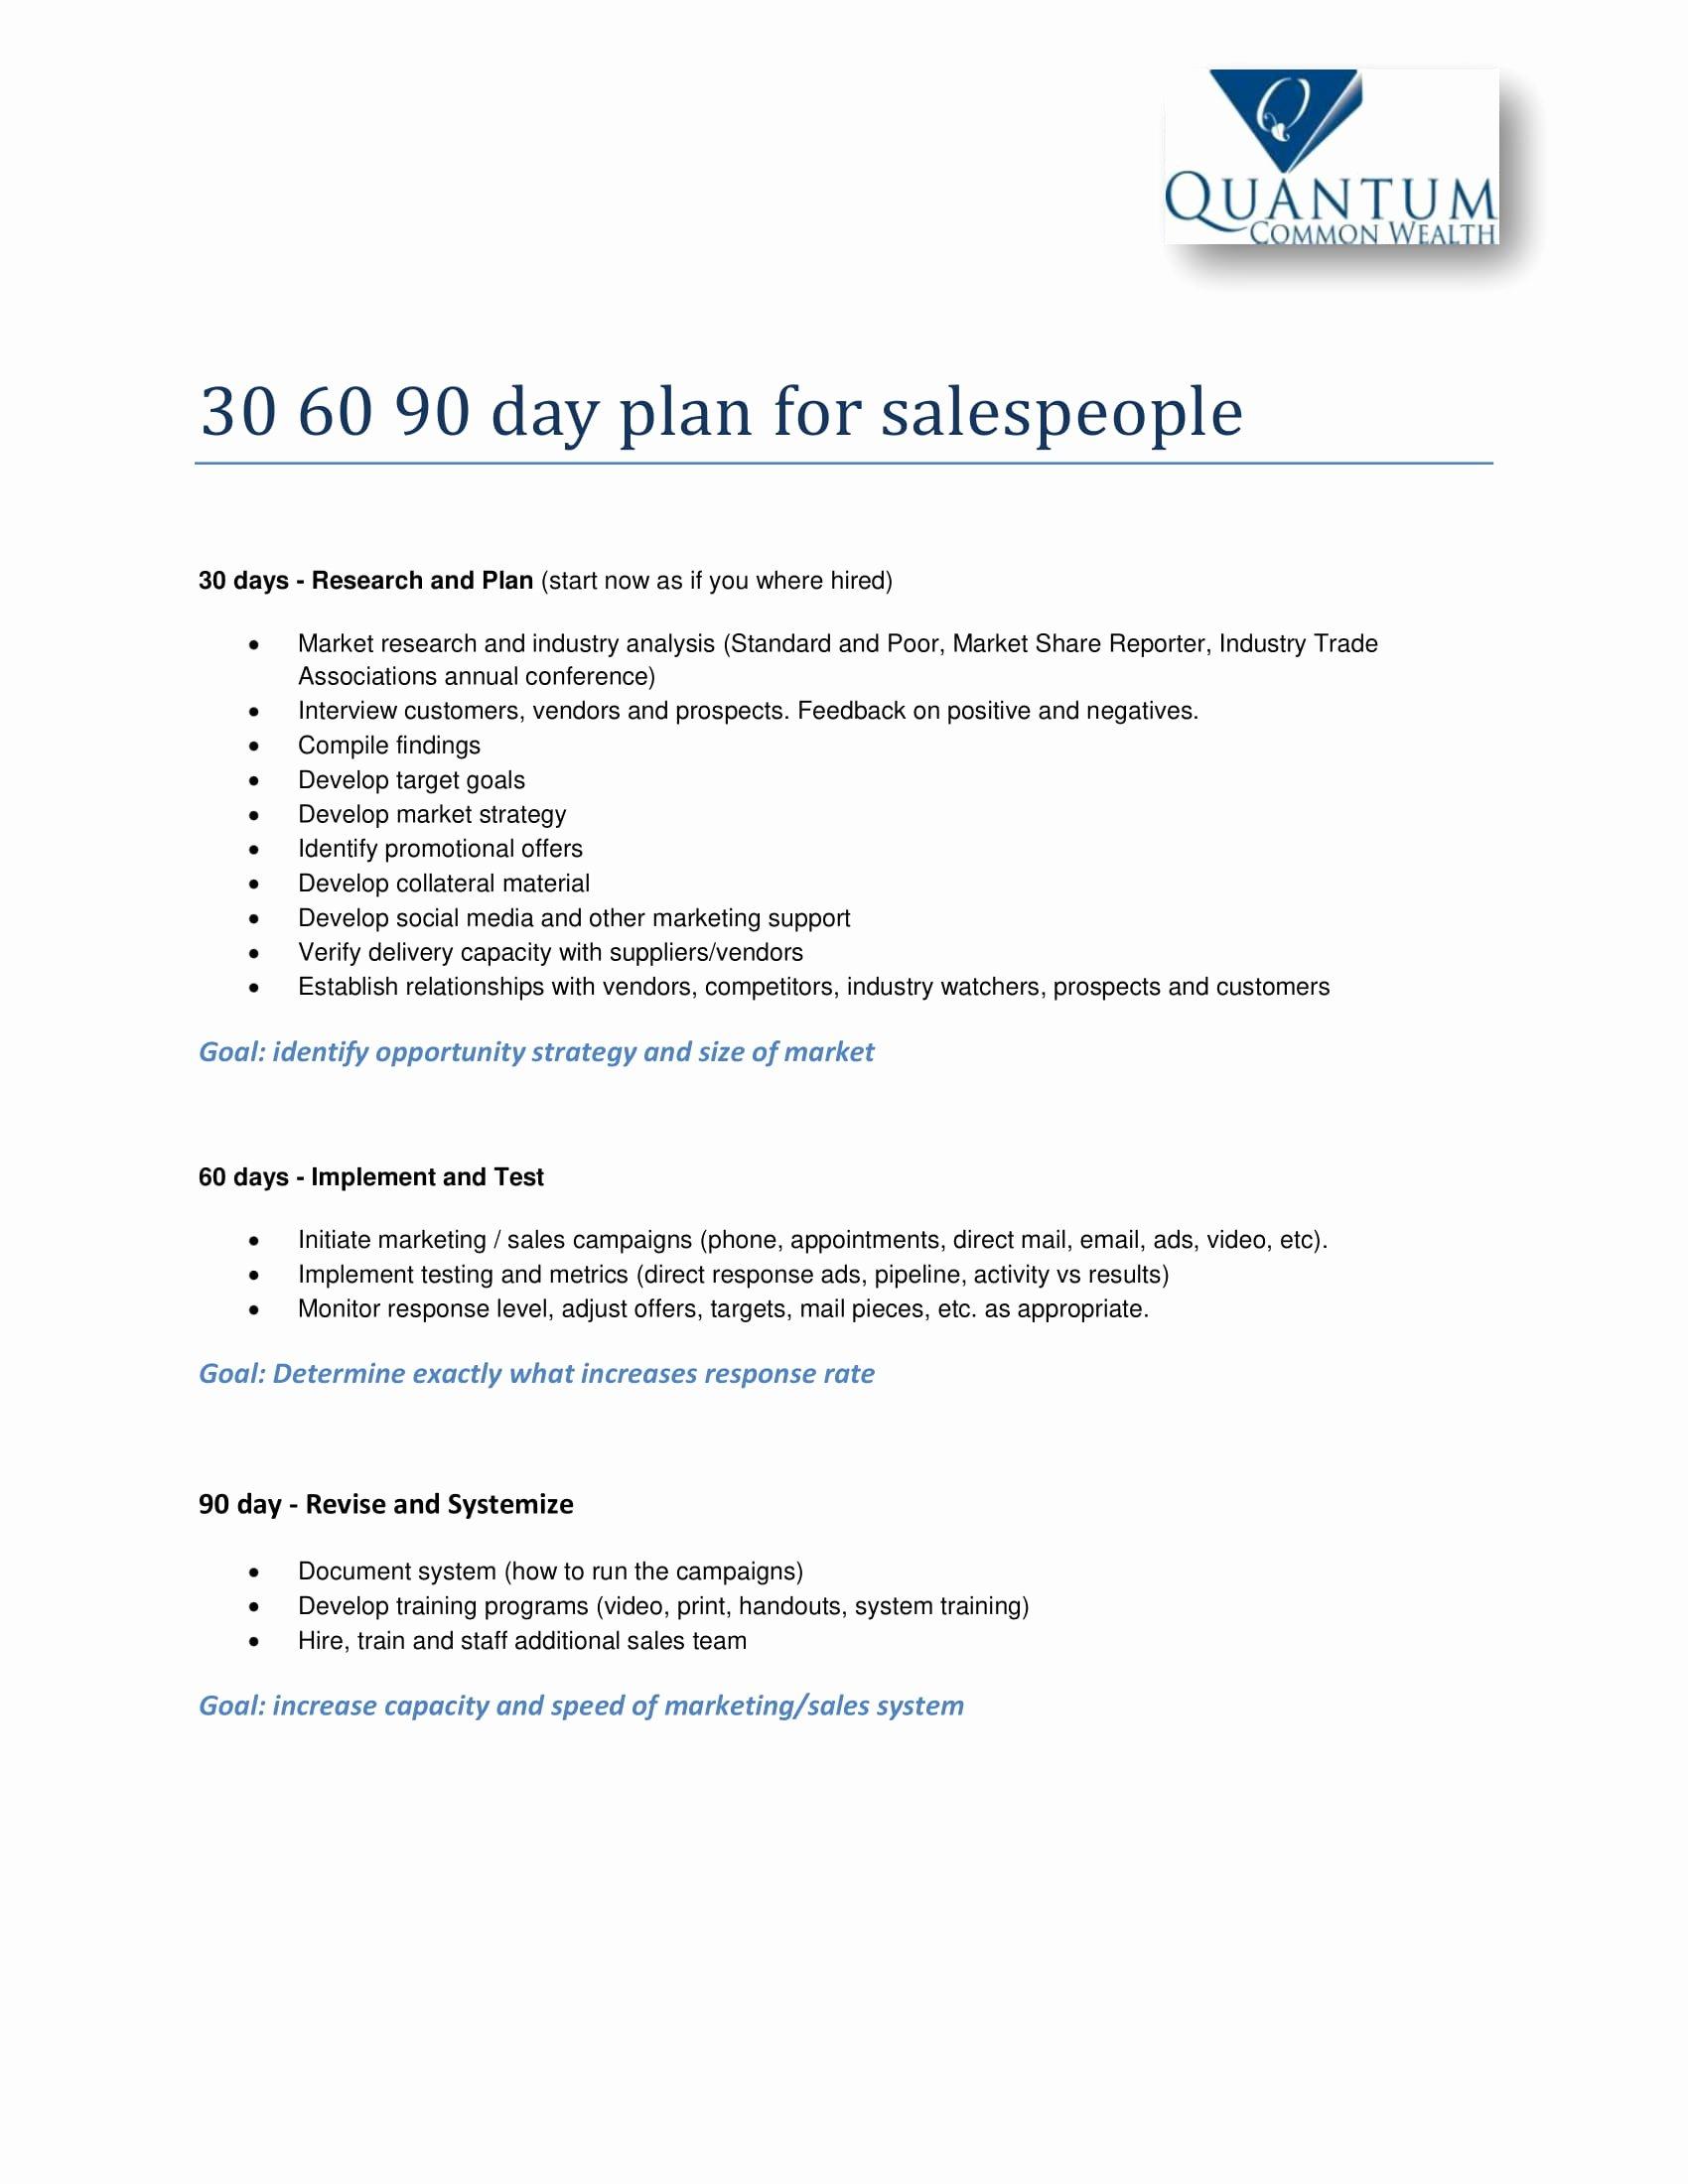 30 60 90 Business Plan Elegant 12 30 60 90 Day Sales Plan Examples Pdf Word